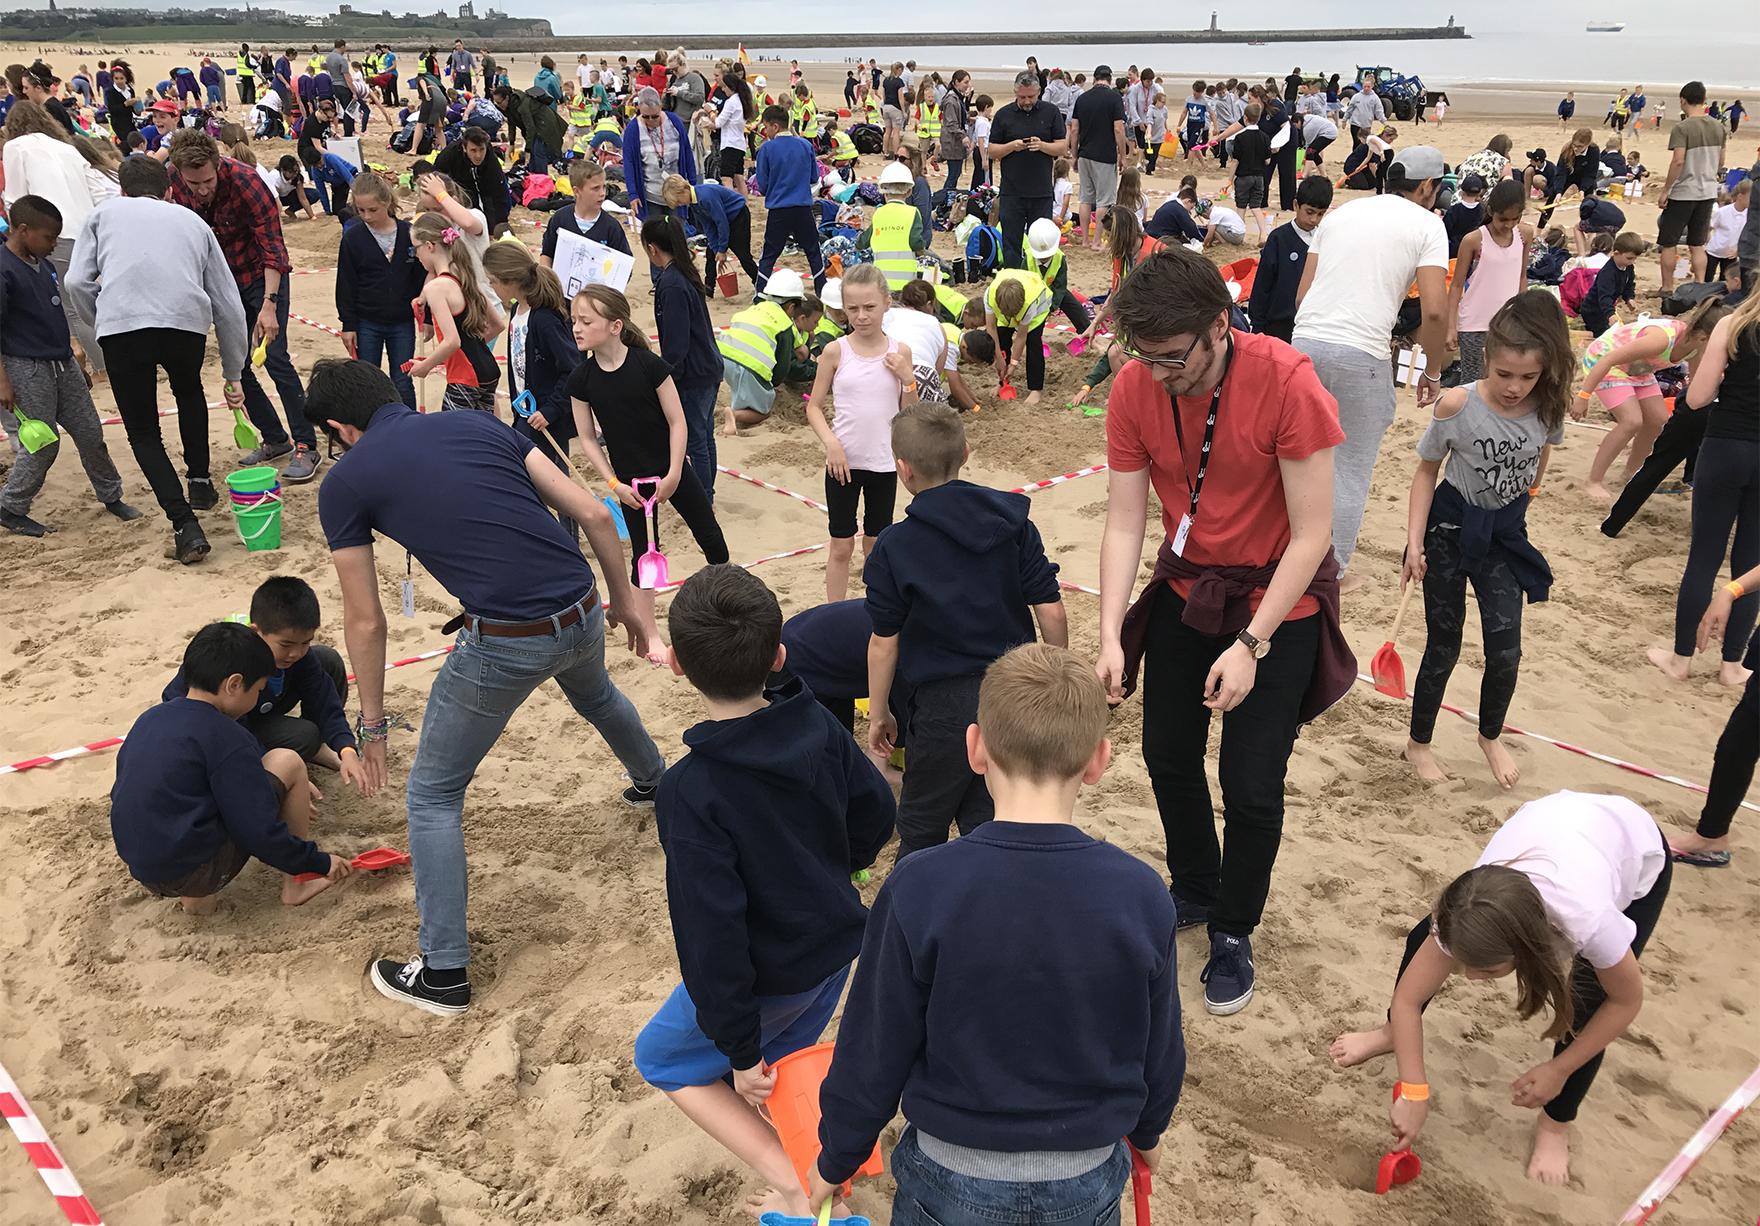 Sandcastle Challenge 2017 Holystone Primary School Sandcastle Building Lh